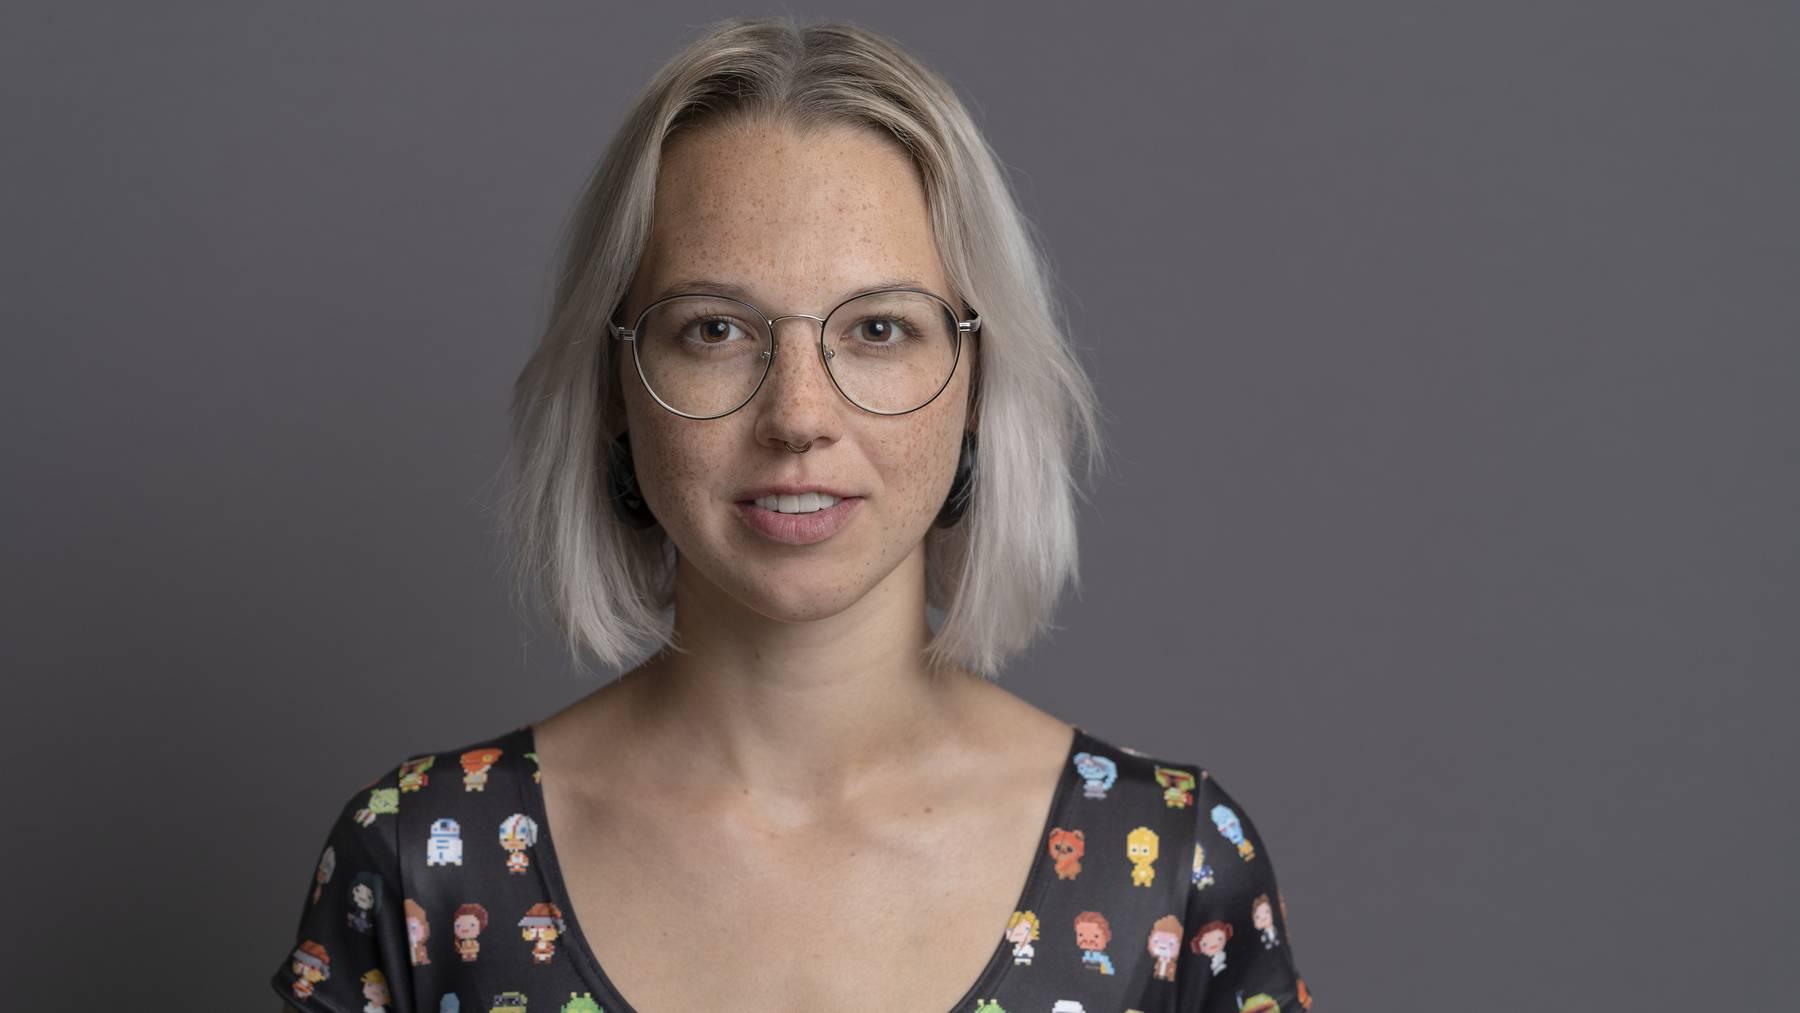 Stefanie Heinzmann ©TV24 Andrea Camen